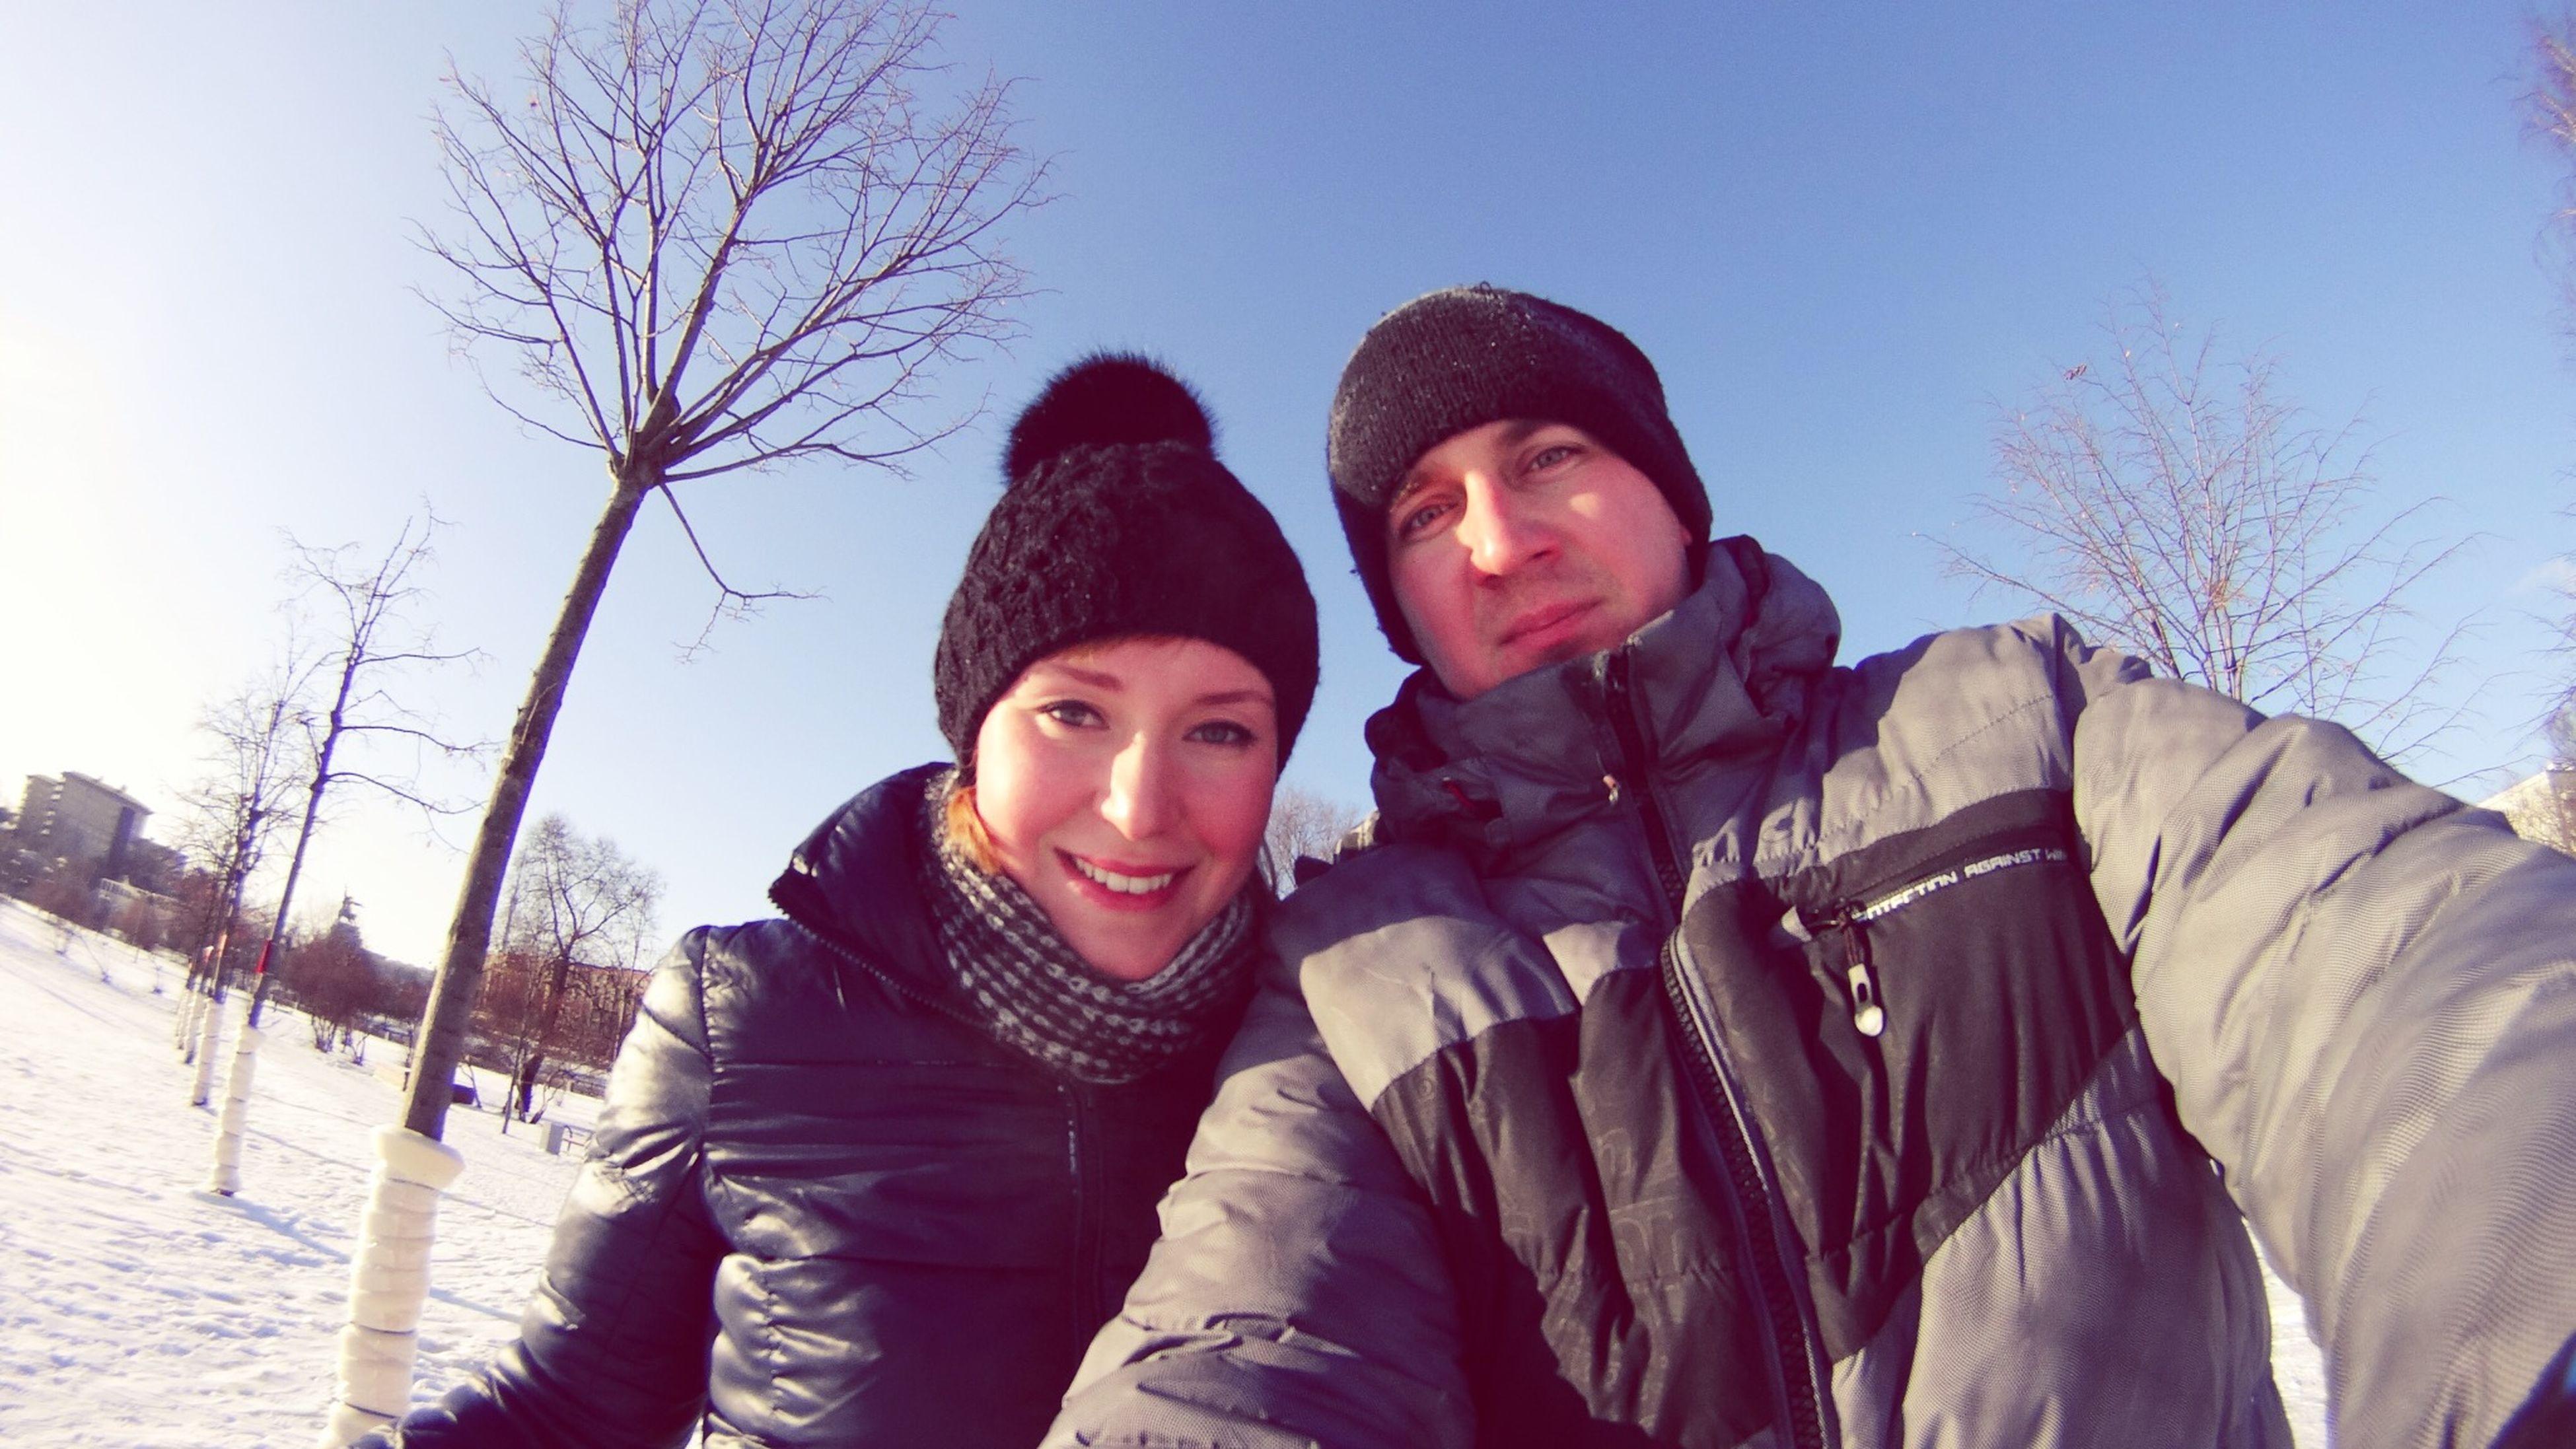 Sunny Winter Day First Eyeem Photo